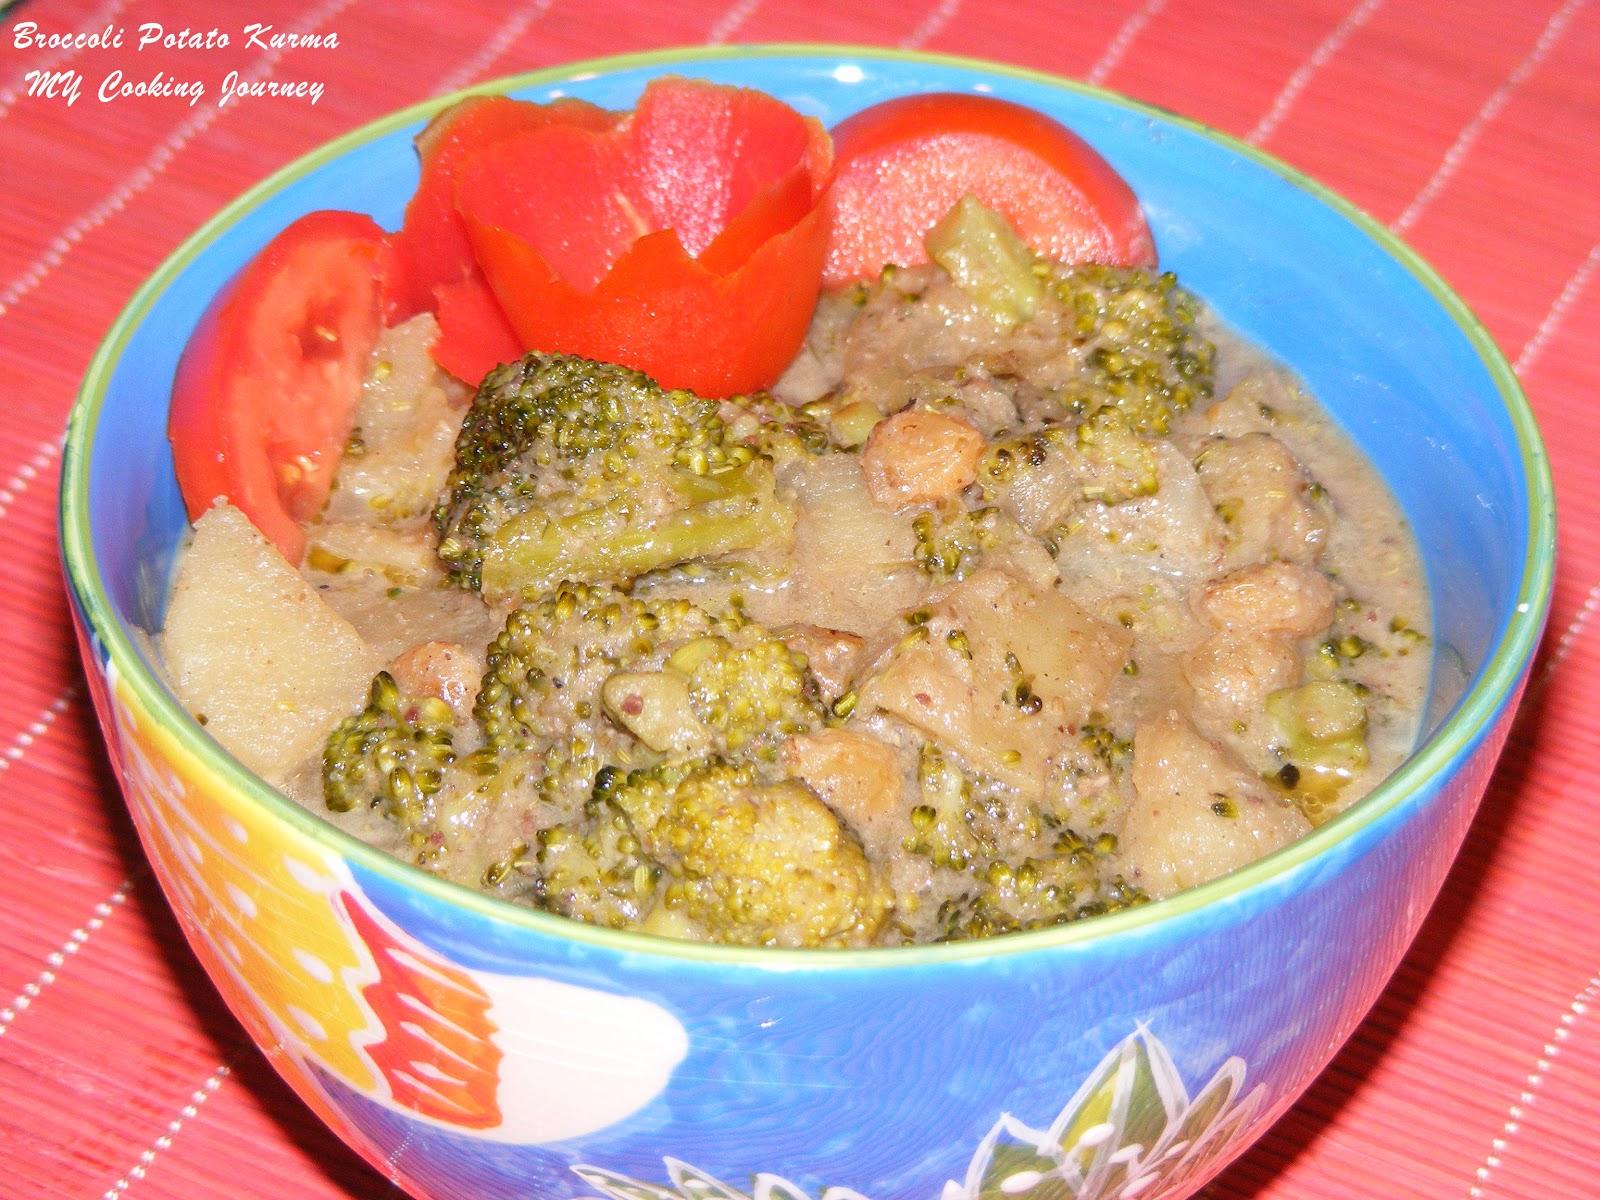 How to Make Fennel, Broccoli and Potato Bake